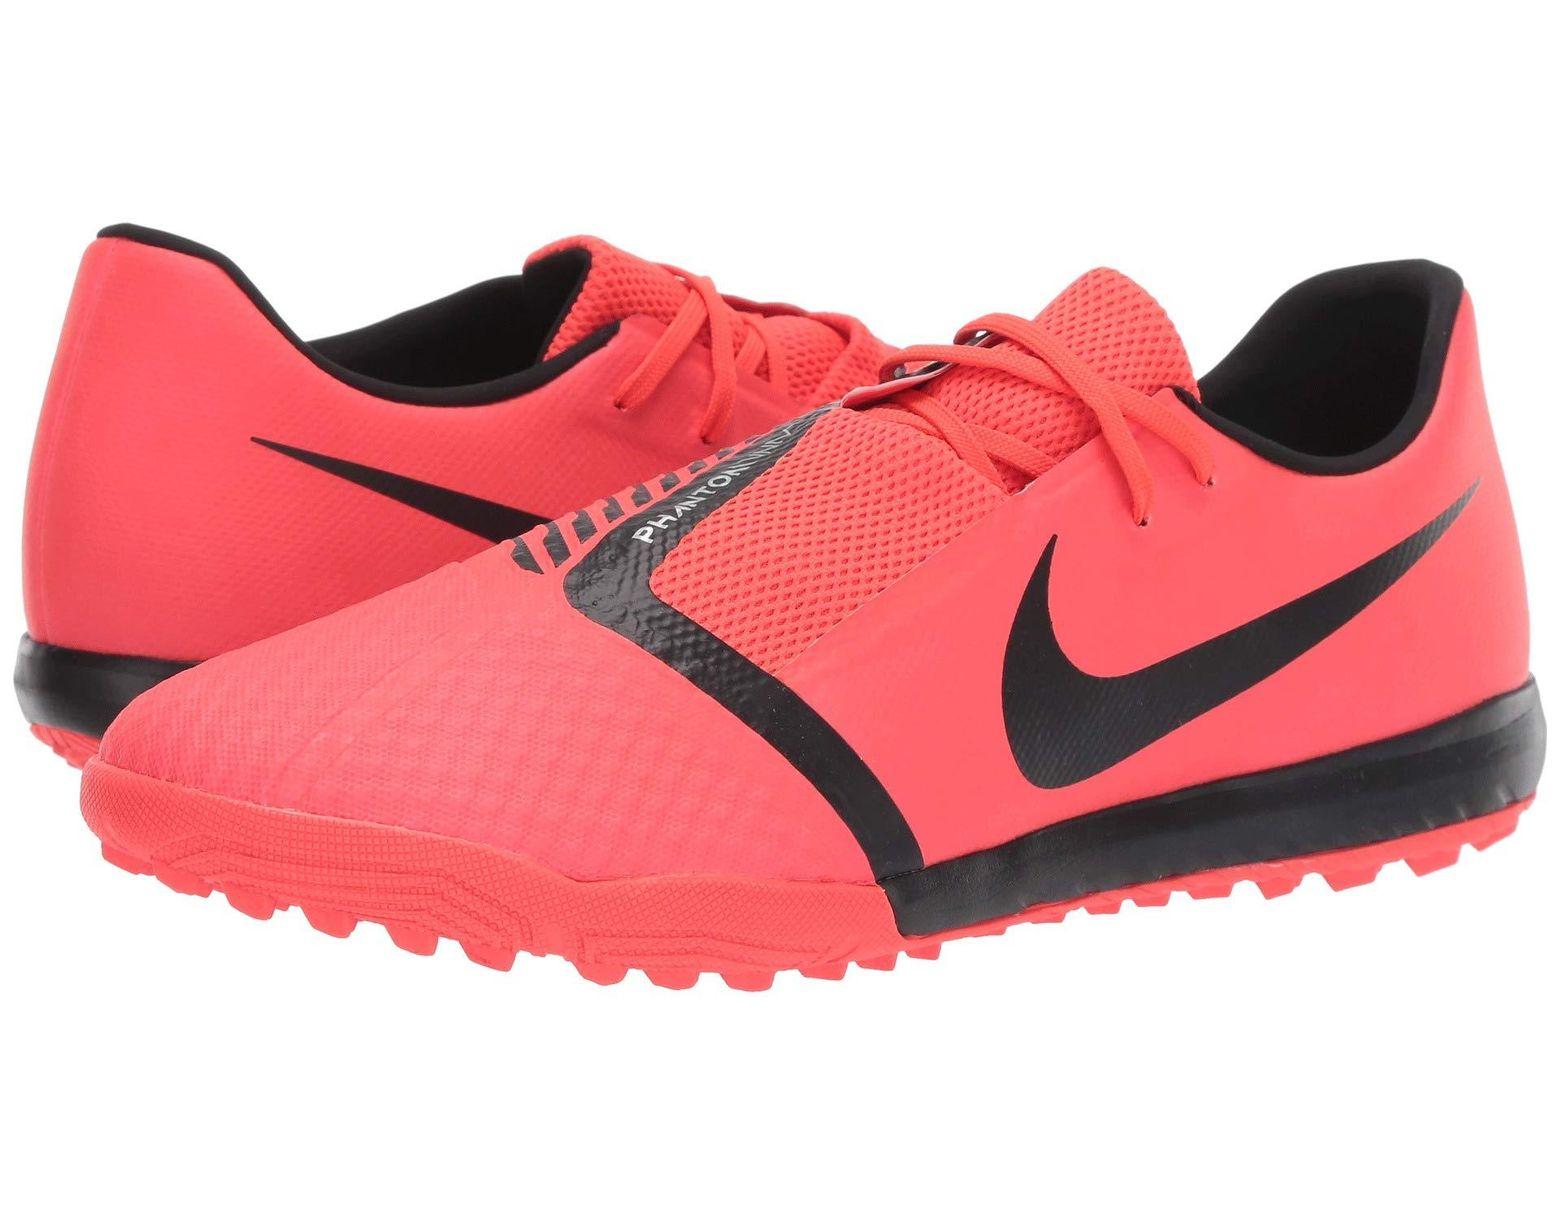 f9fe6c483 Nike Phantom Venom Academy Tf (black metallic Vivid Gold) Men s Soccer Shoes  in Pink for Men - Lyst